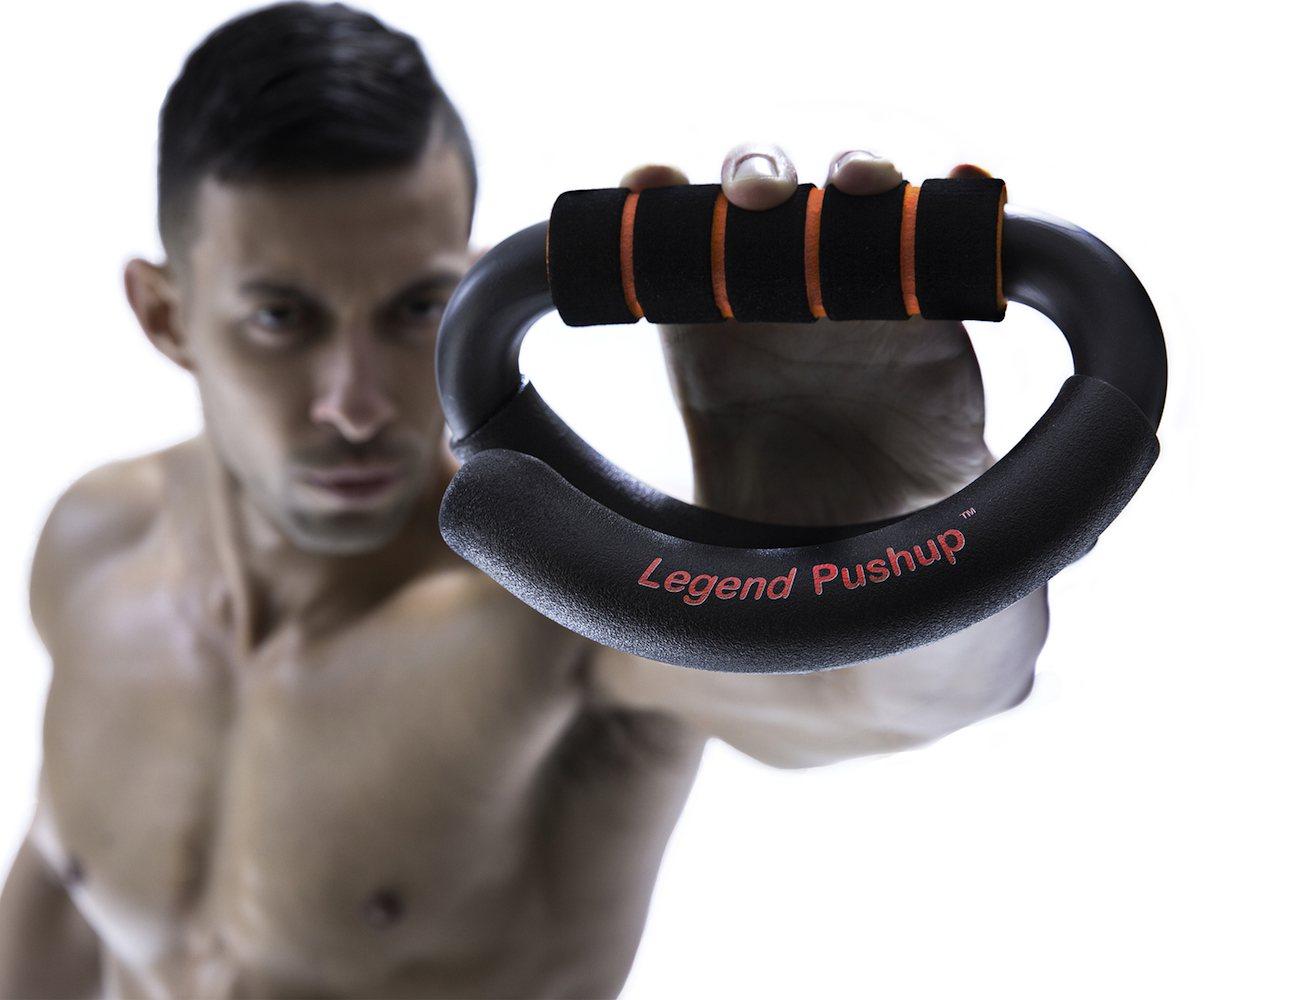 legend-pushup-01